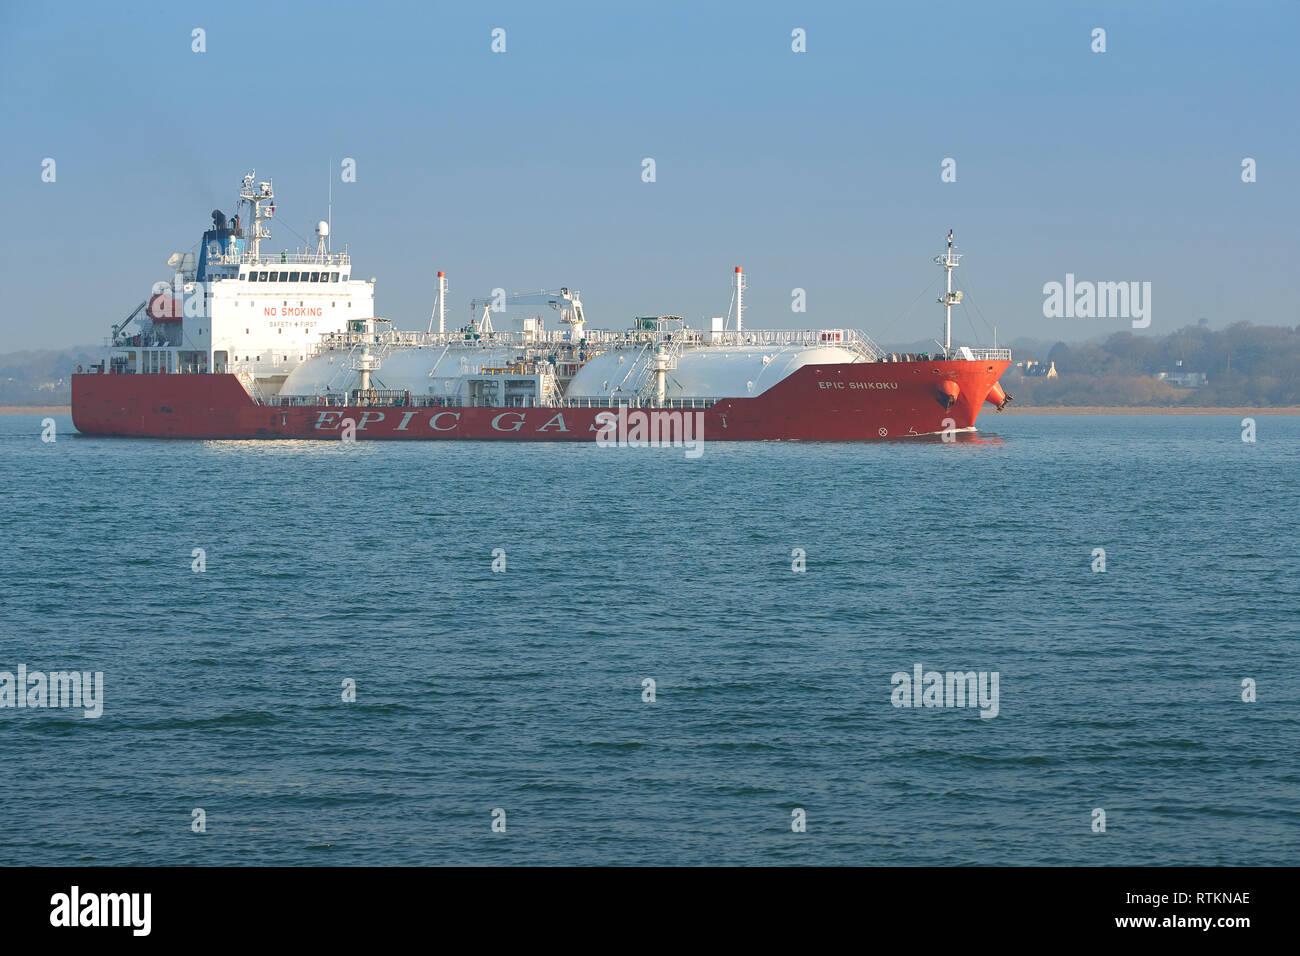 The EPIC SHIPPING CHARTERING PTE, LPG Tanker, EPIC SHIKOKU, Departs